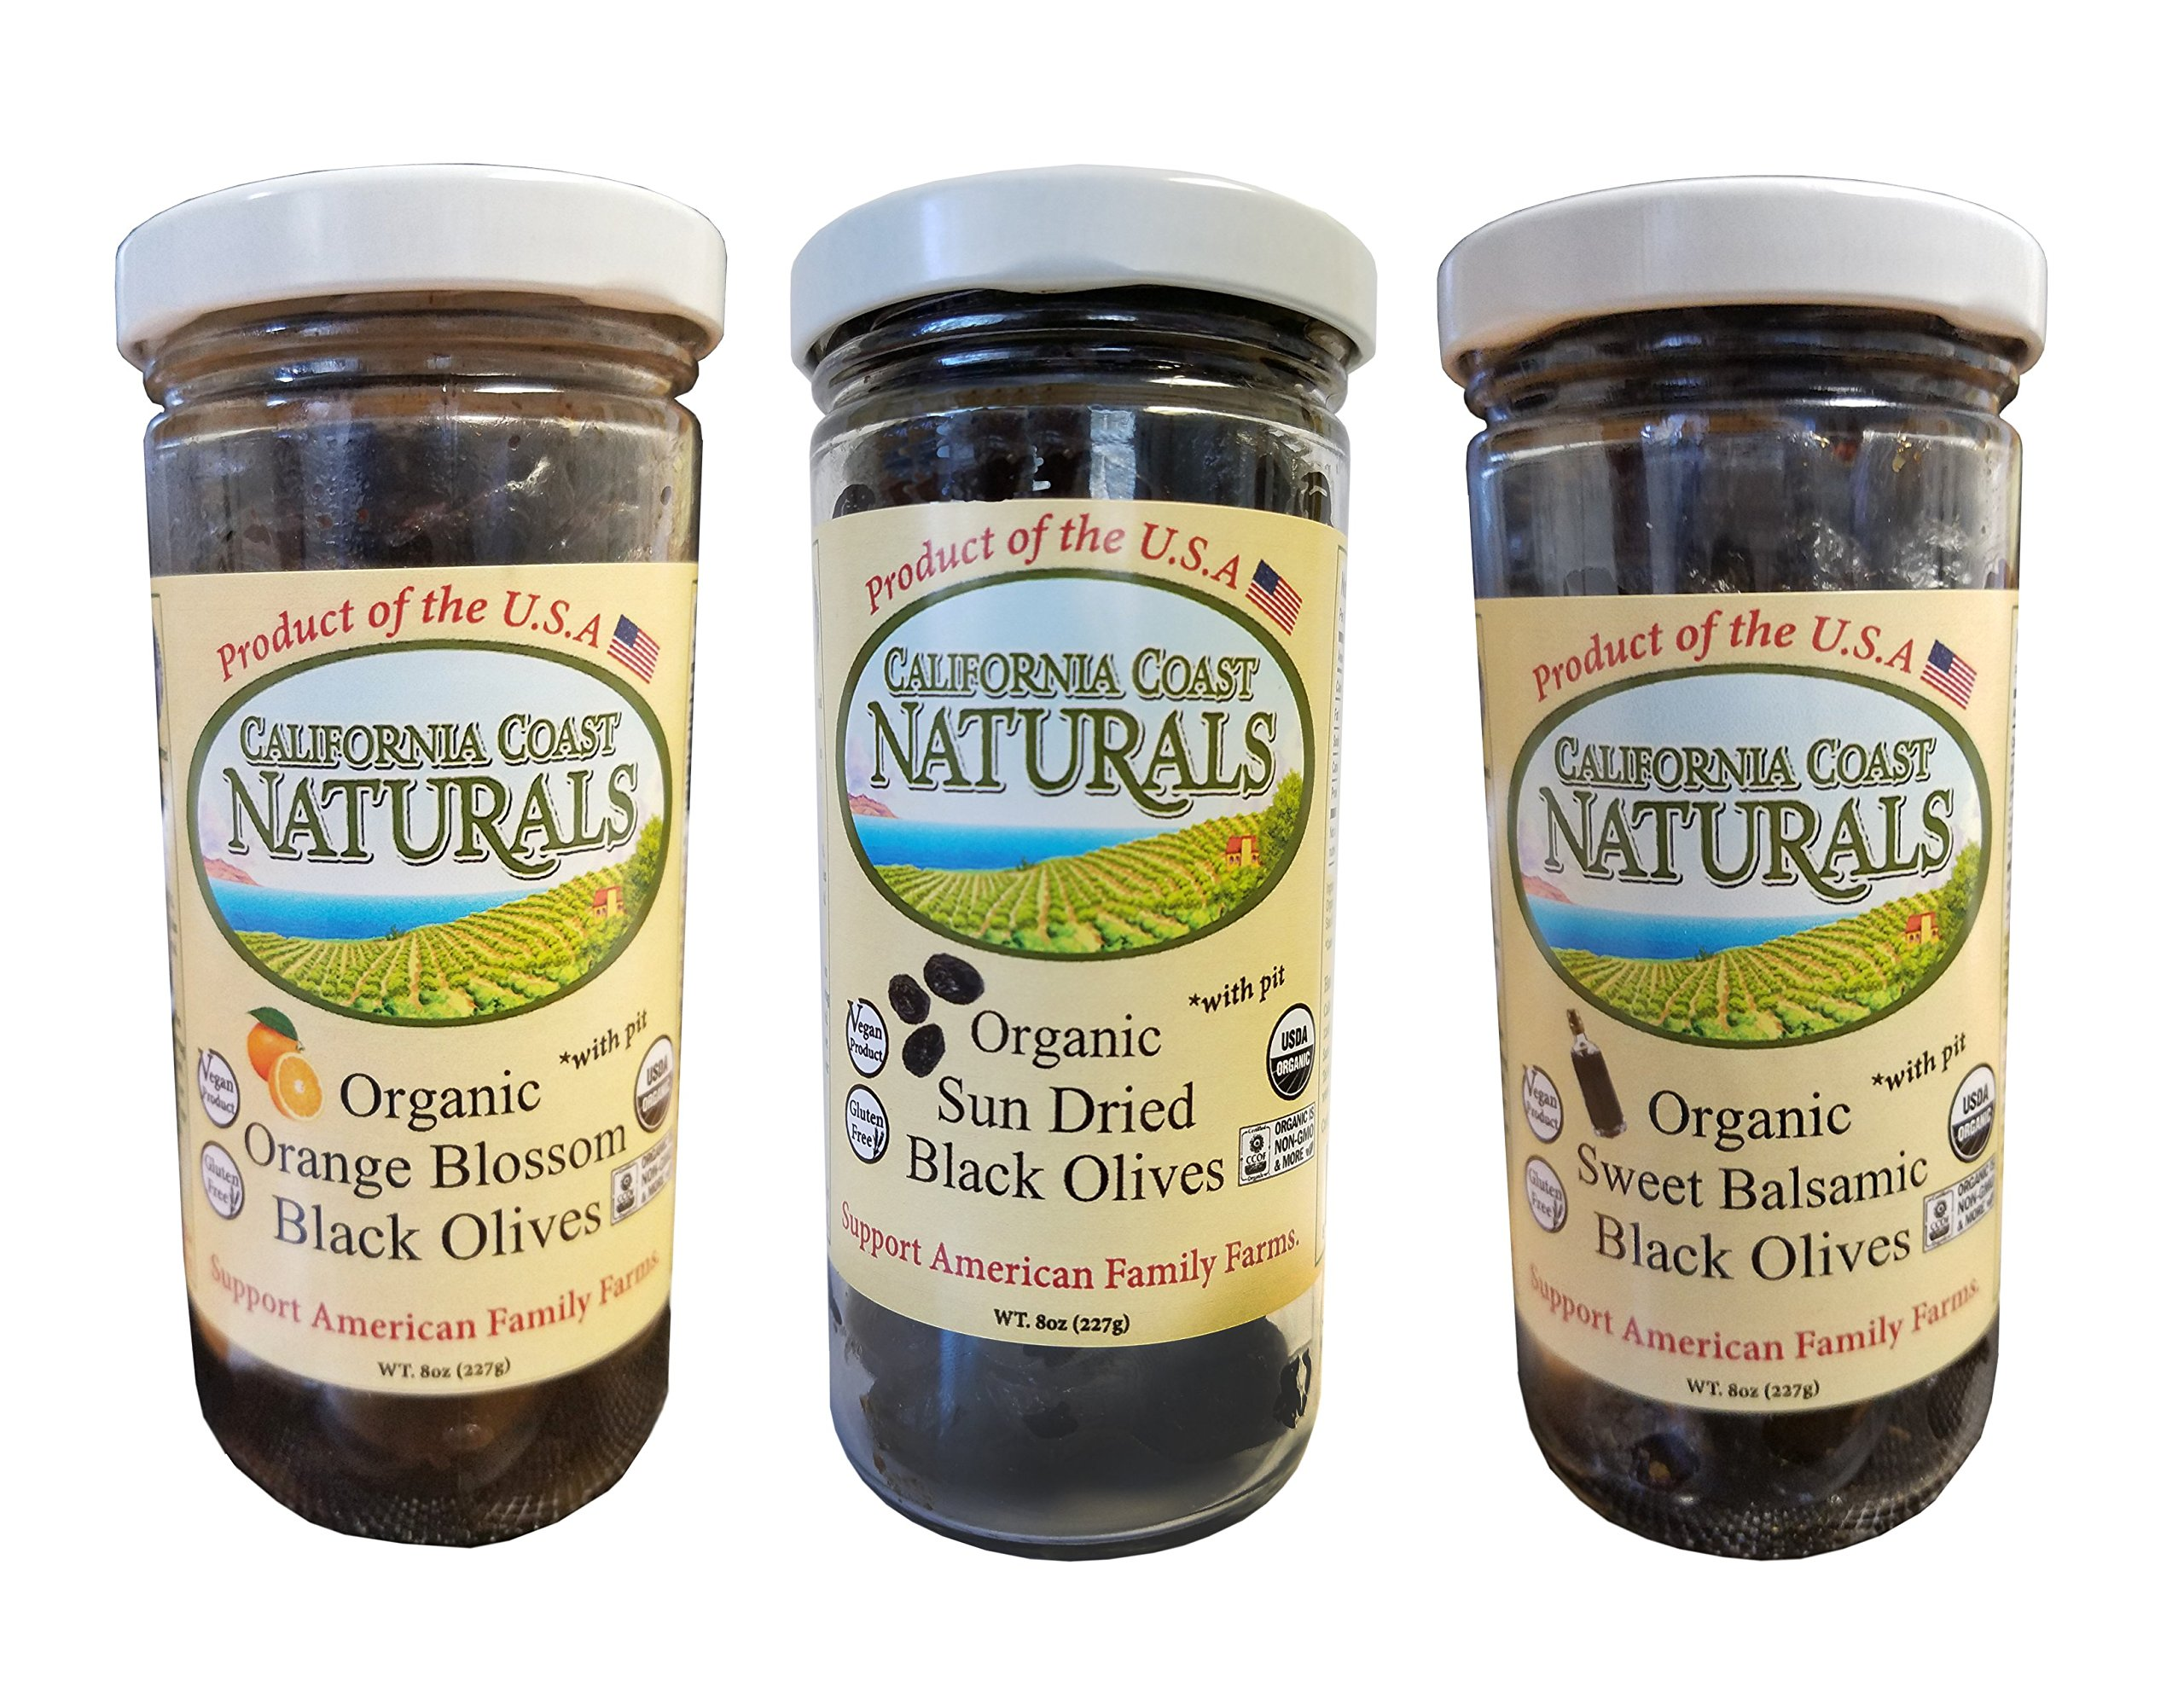 California Coast Naturals Hand Picked USDA Organic Sun Dried Olive 3 Pack, Non-GMO, Gluten Free